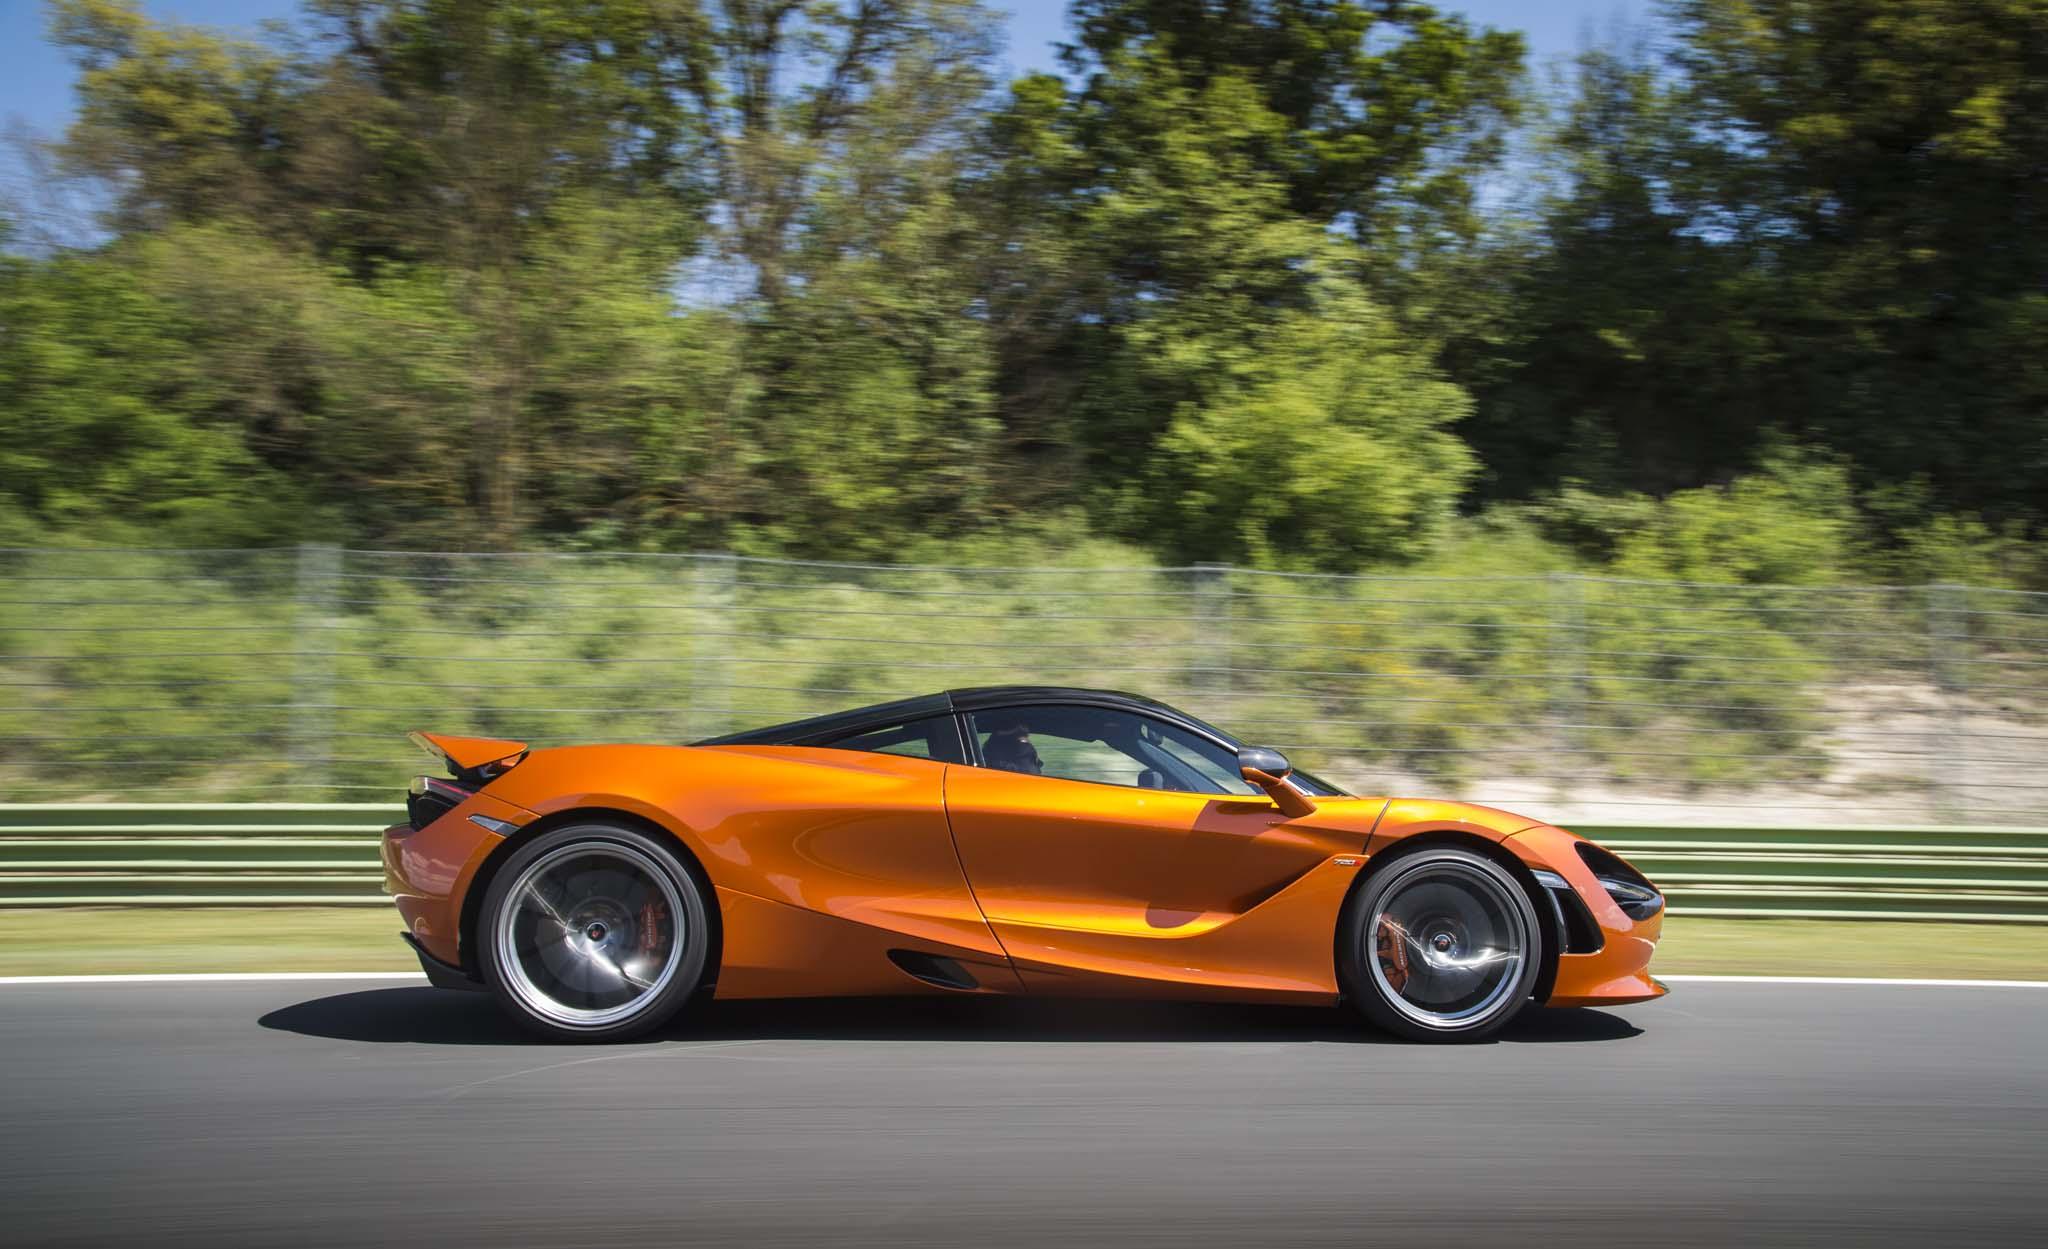 [Imagen: 2018-McLaren-720S-side-in-motion-04.jpg]